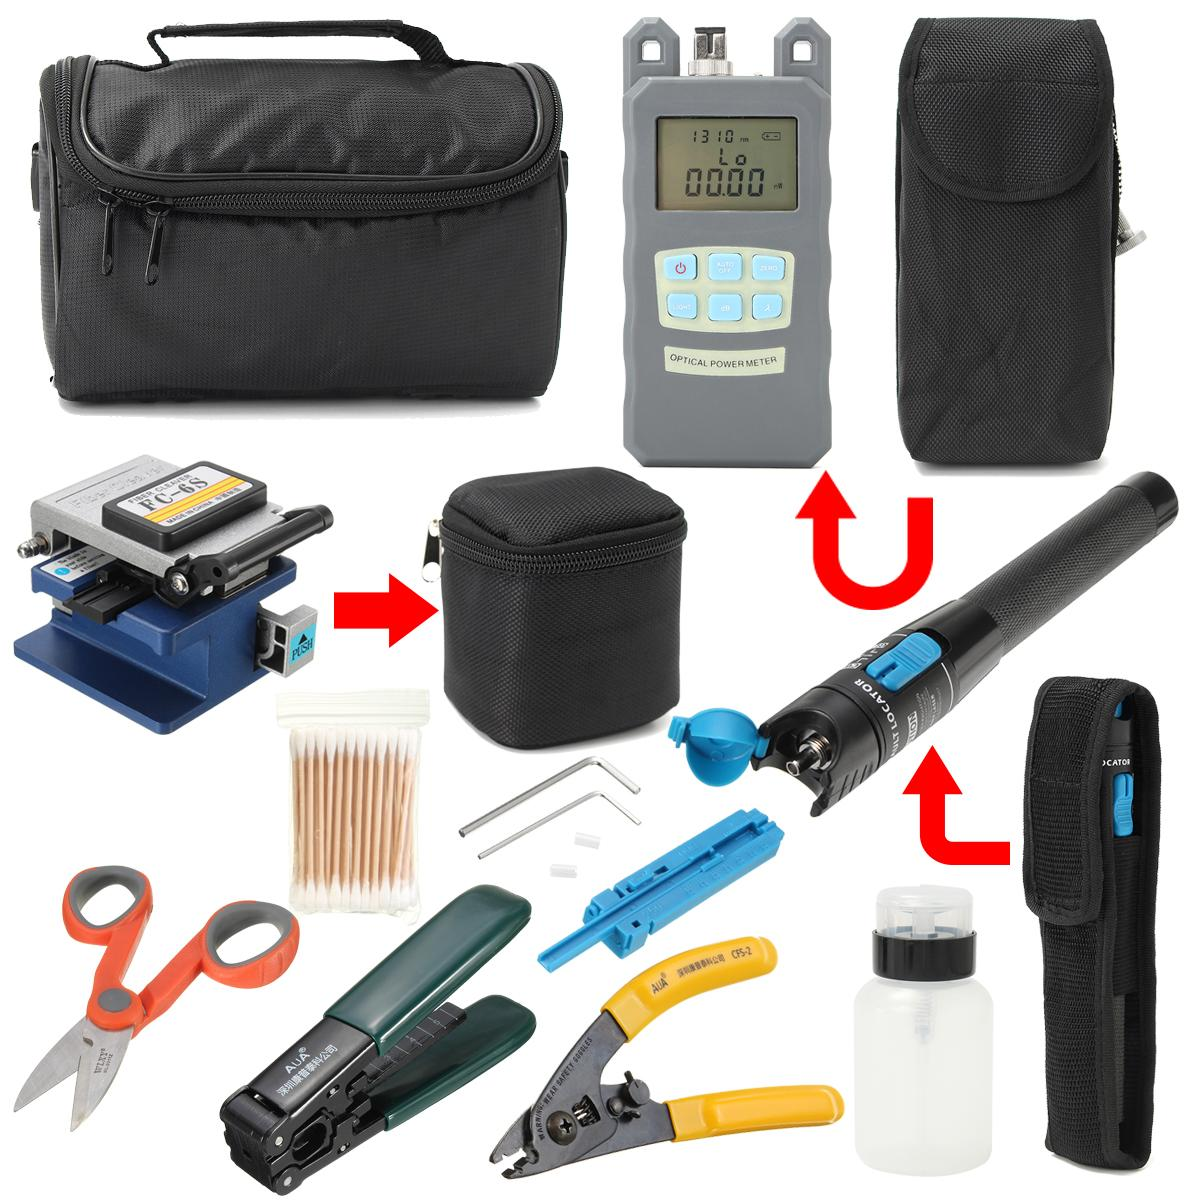 11Pcs Fiber Optic FTTH Tool Kit FC-6S+Fiber Cleaver+Power Meter Splice Strip: Buy Online at Best Prices in Pakistan | Daraz.pk